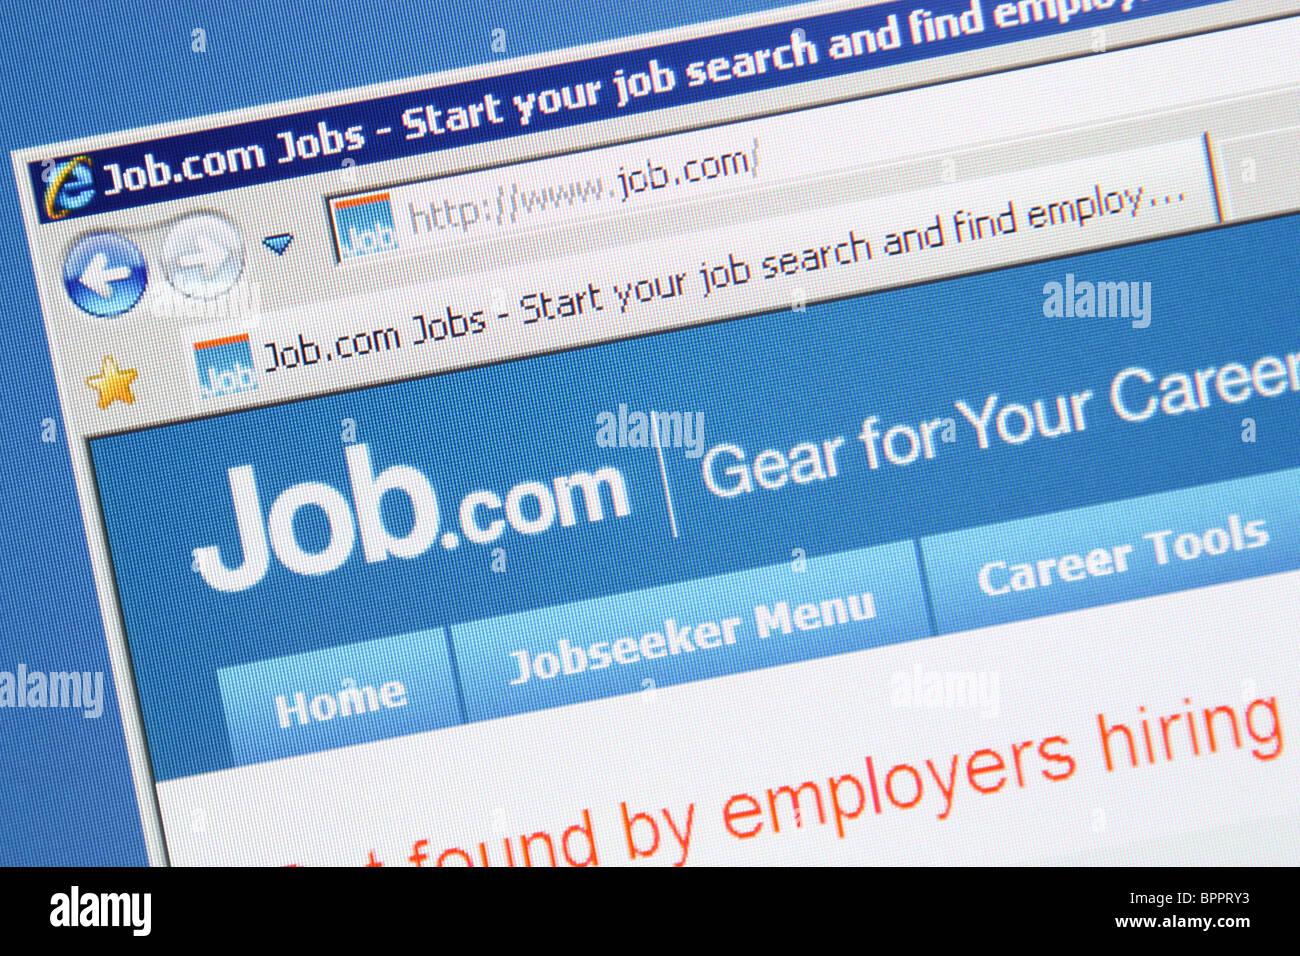 job.com online job search - Stock Image